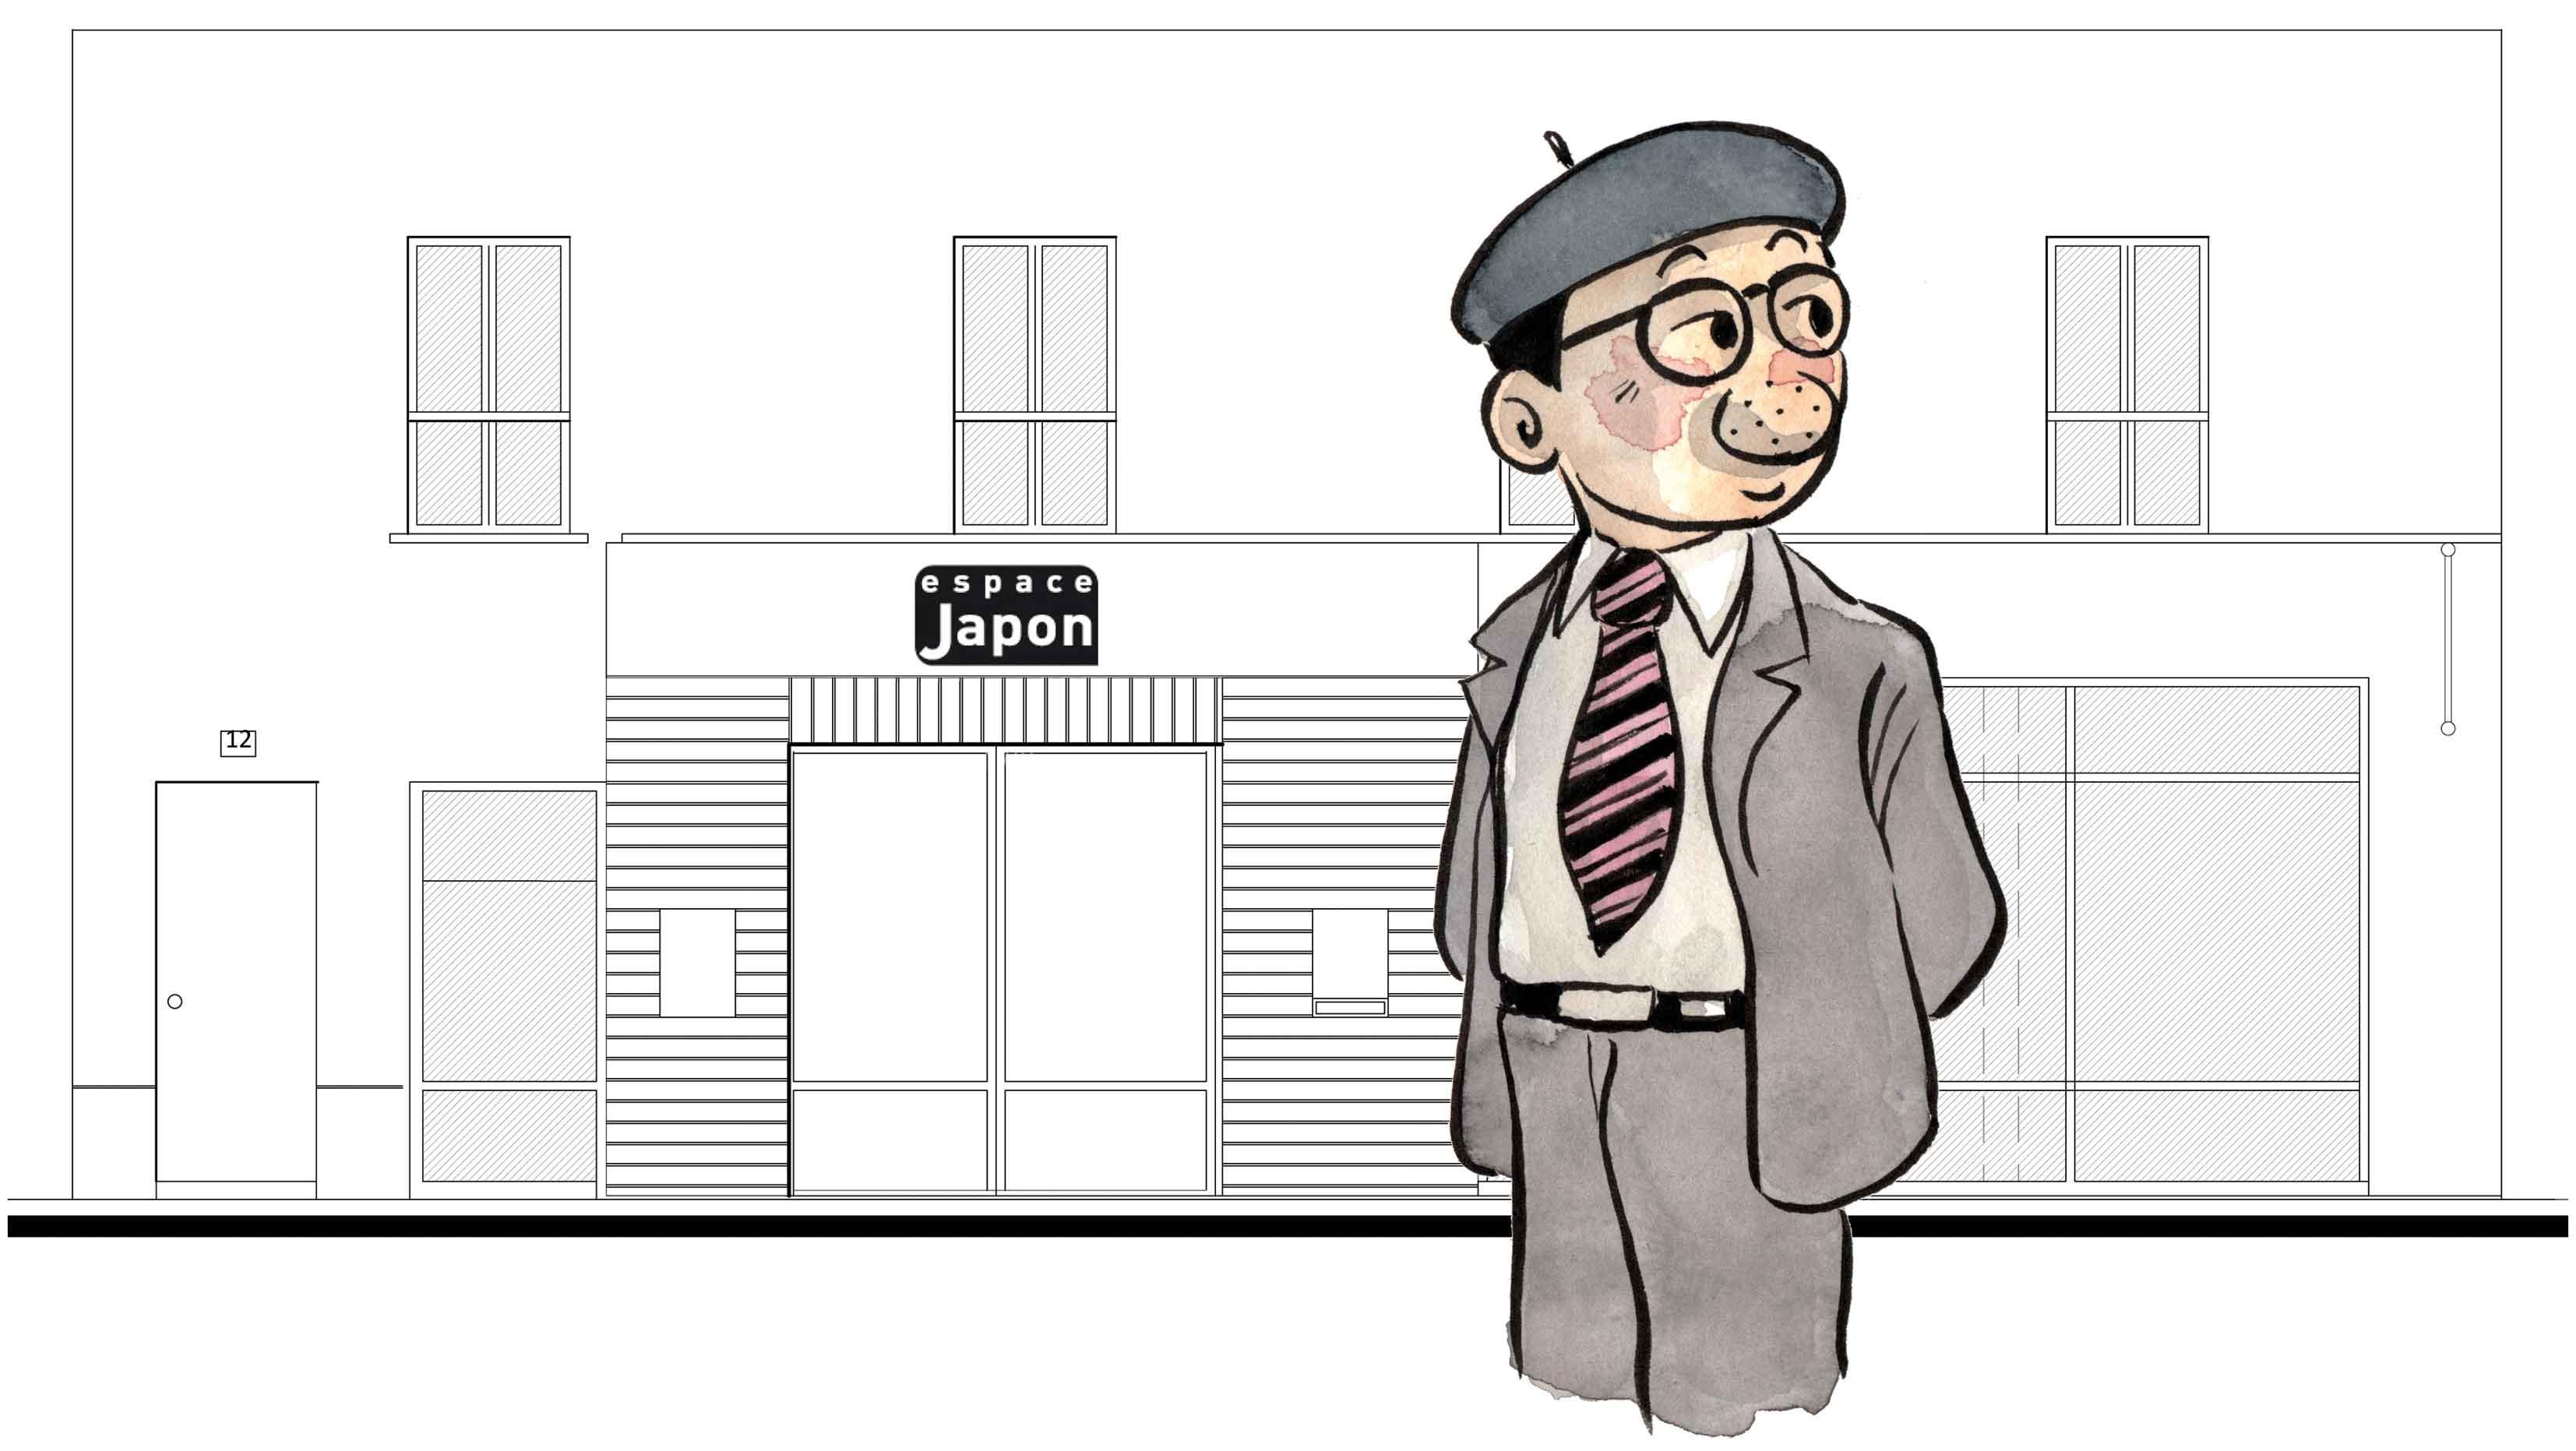 Une exposition en hommage à Osamu Tezuka